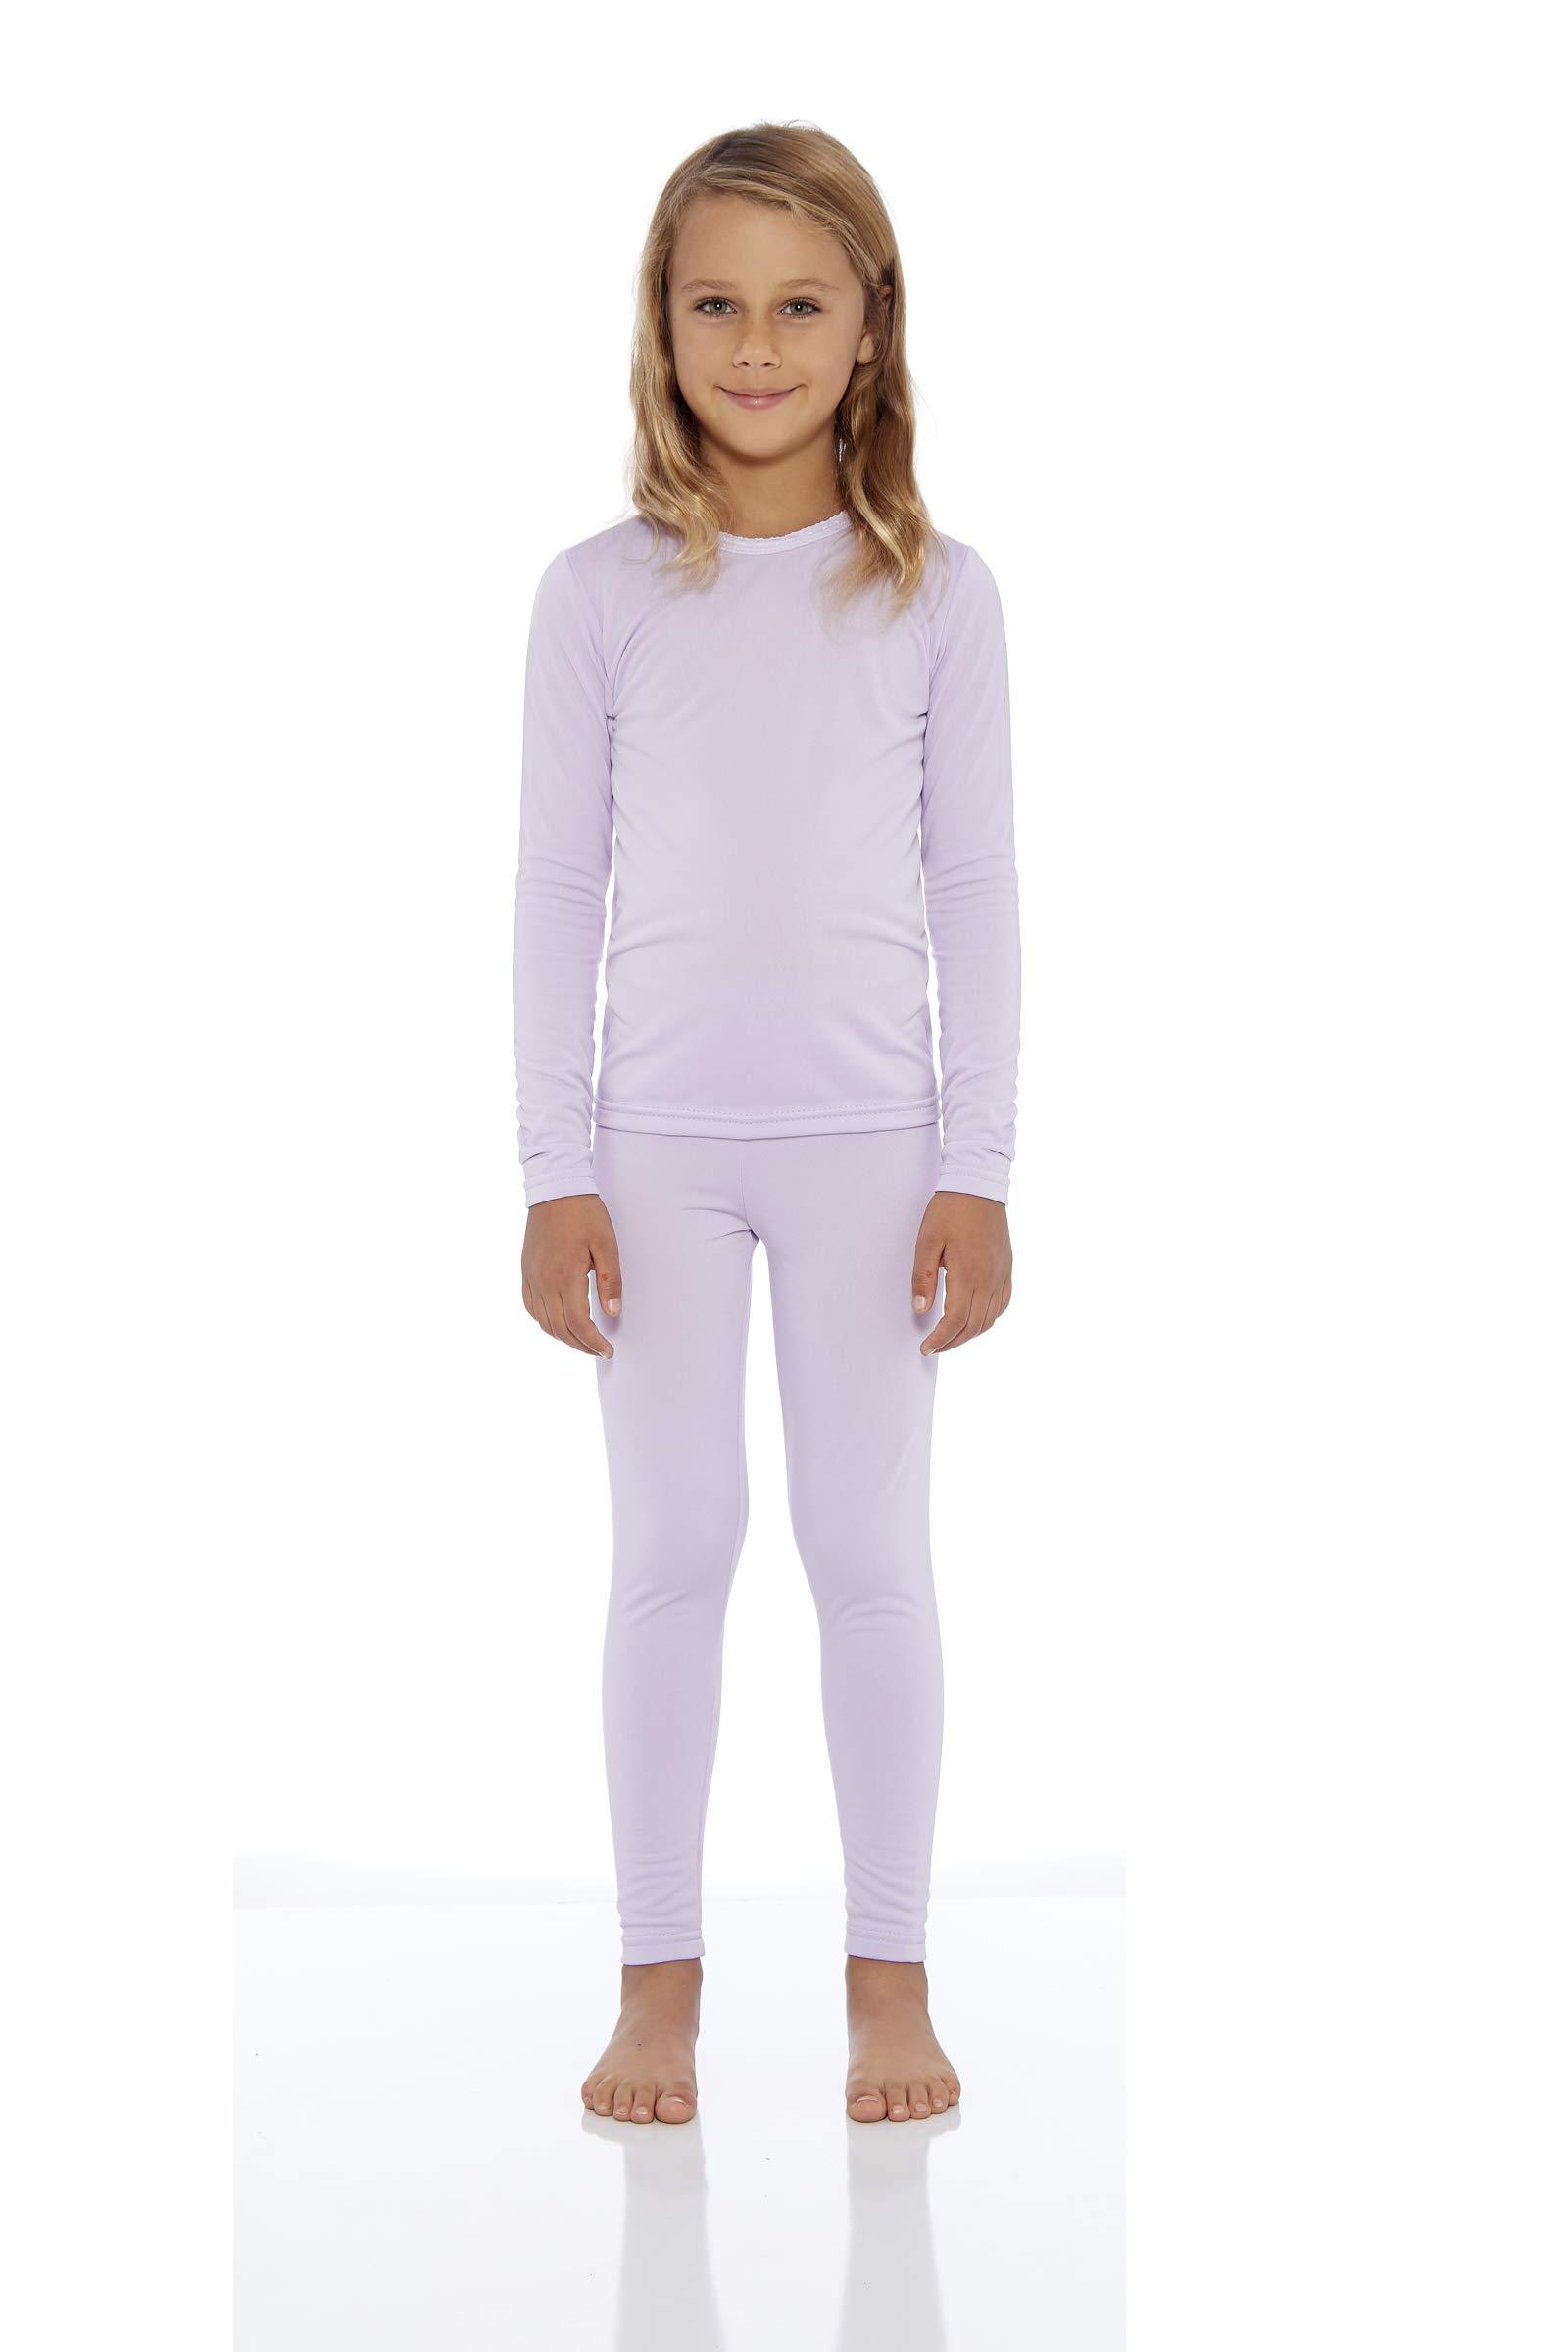 Rocky Girl's Smooth Knit Thermal Underwear 2PC Set Long John Top and Bottom Pajamas (XXS, Light Purple) by Rocky